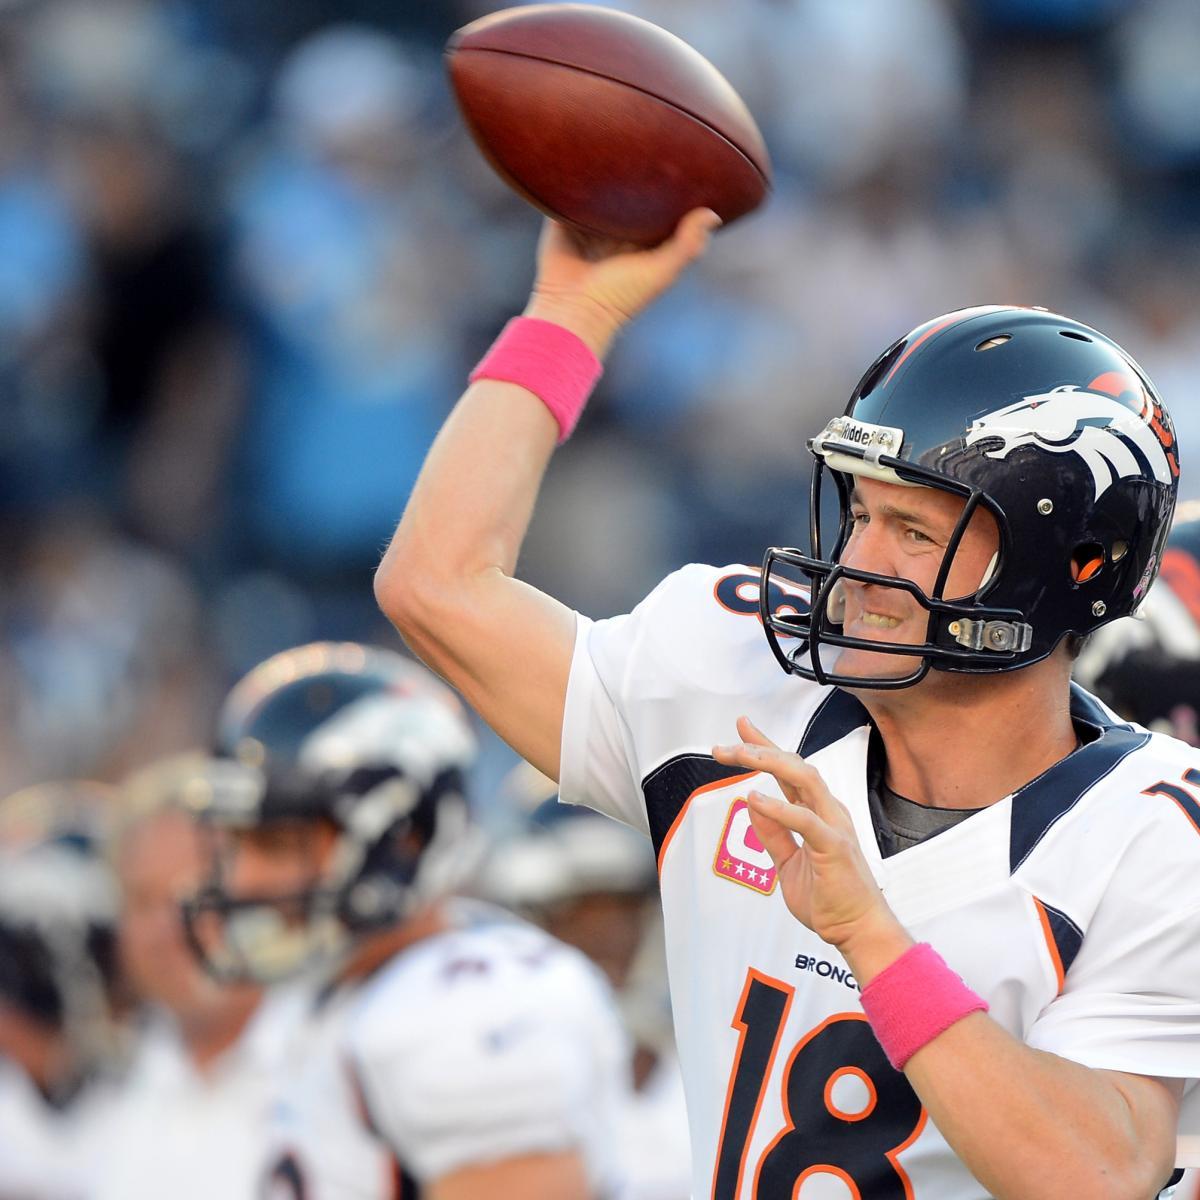 Denver Broncos Vs Detroit Lions Live Score Highlights And: Fantasy Football Week 8 Rankings: Top 25 Quarterbacks